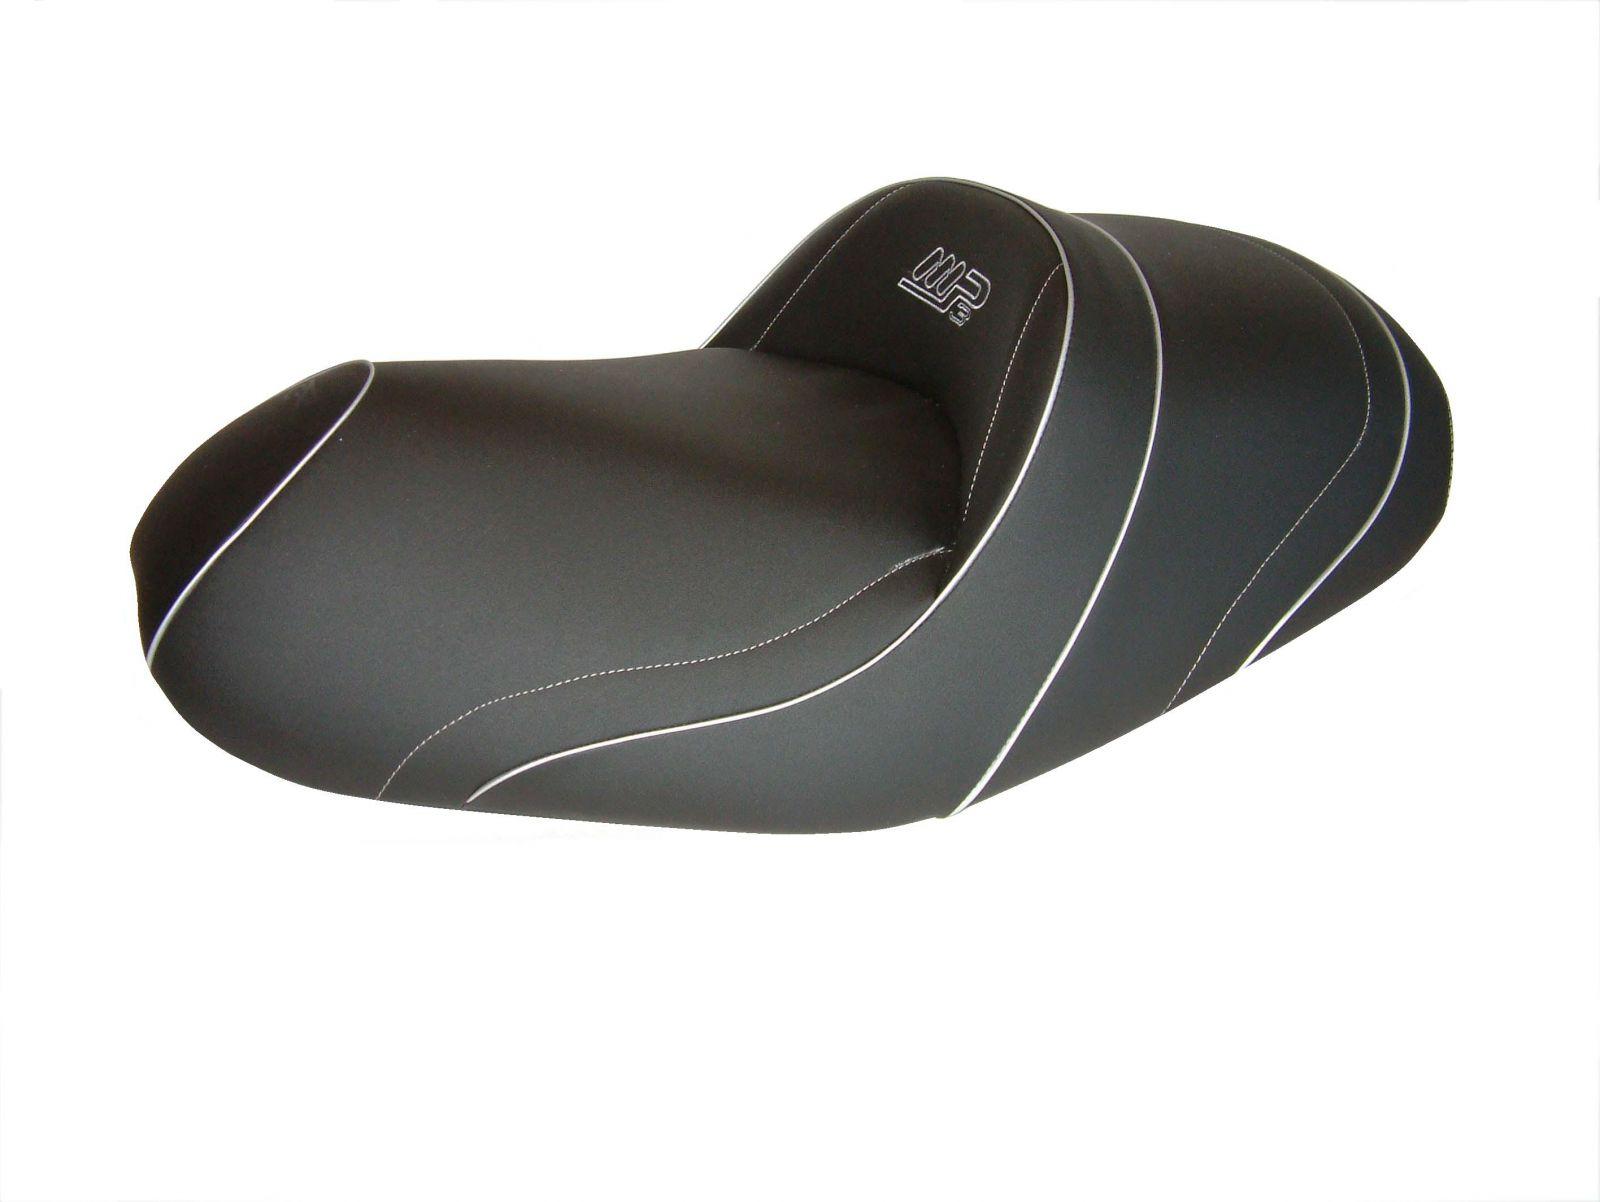 Asiento Gran Confort SGC1755 - PIAGGIO MP3 125 [2006-2013]